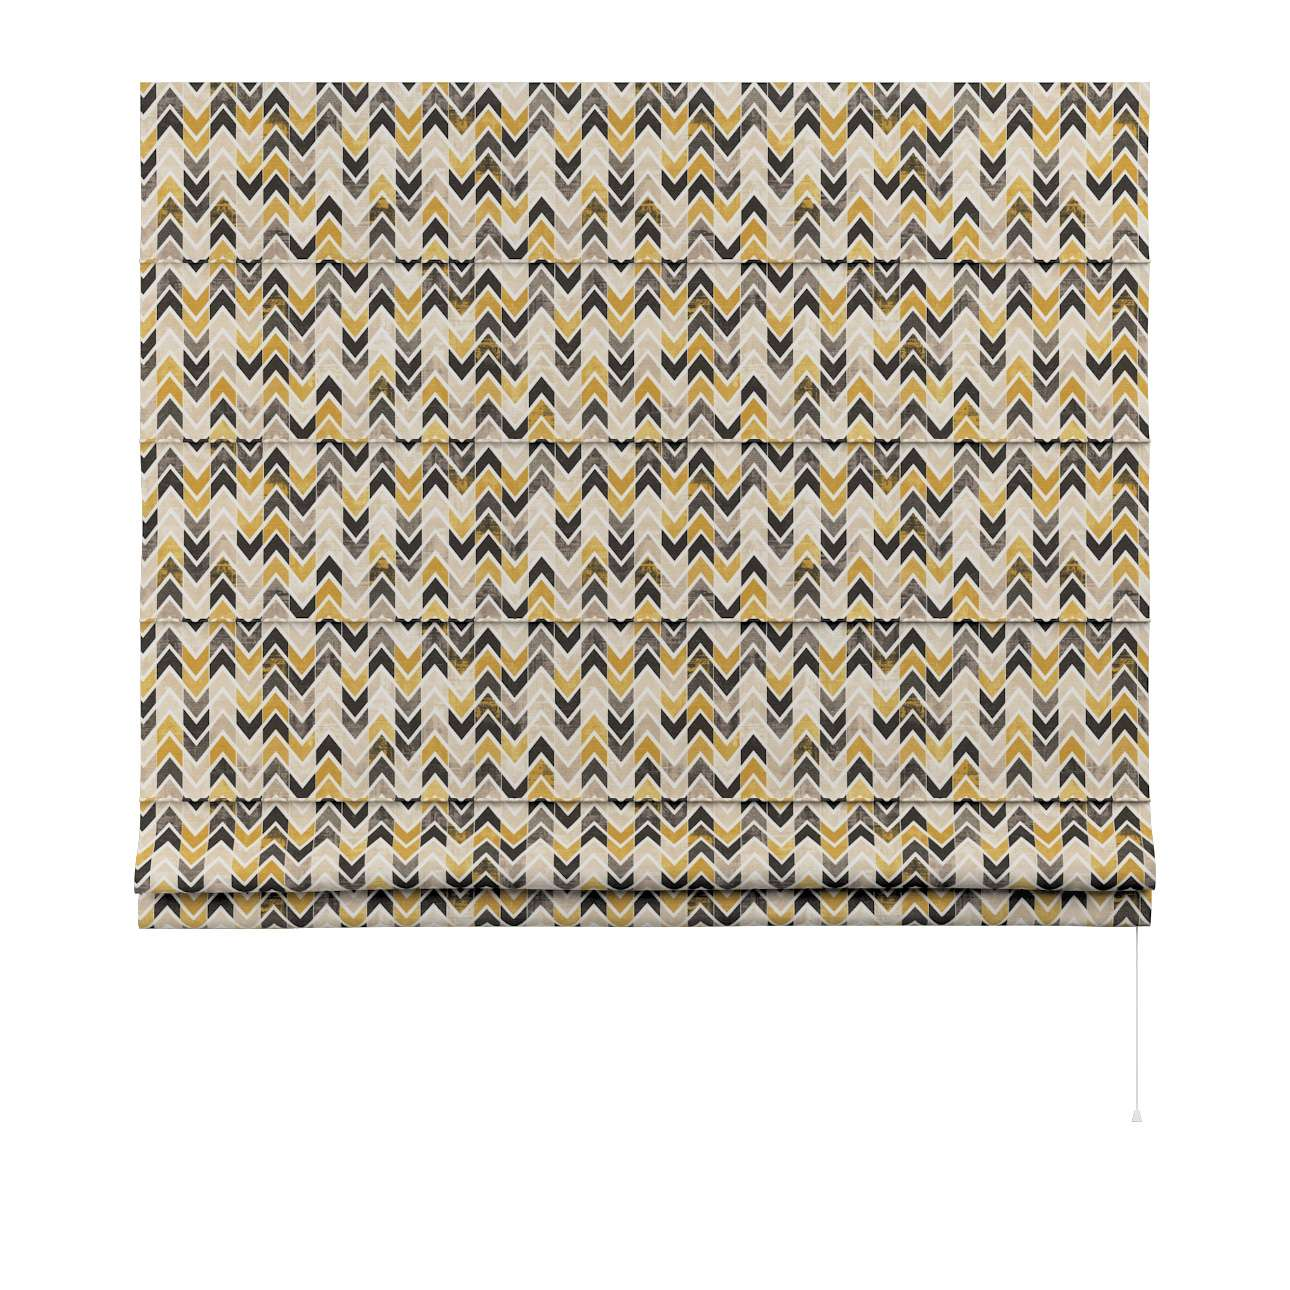 Rímska roleta Capri V kolekcii Modern, tkanina: 142-79